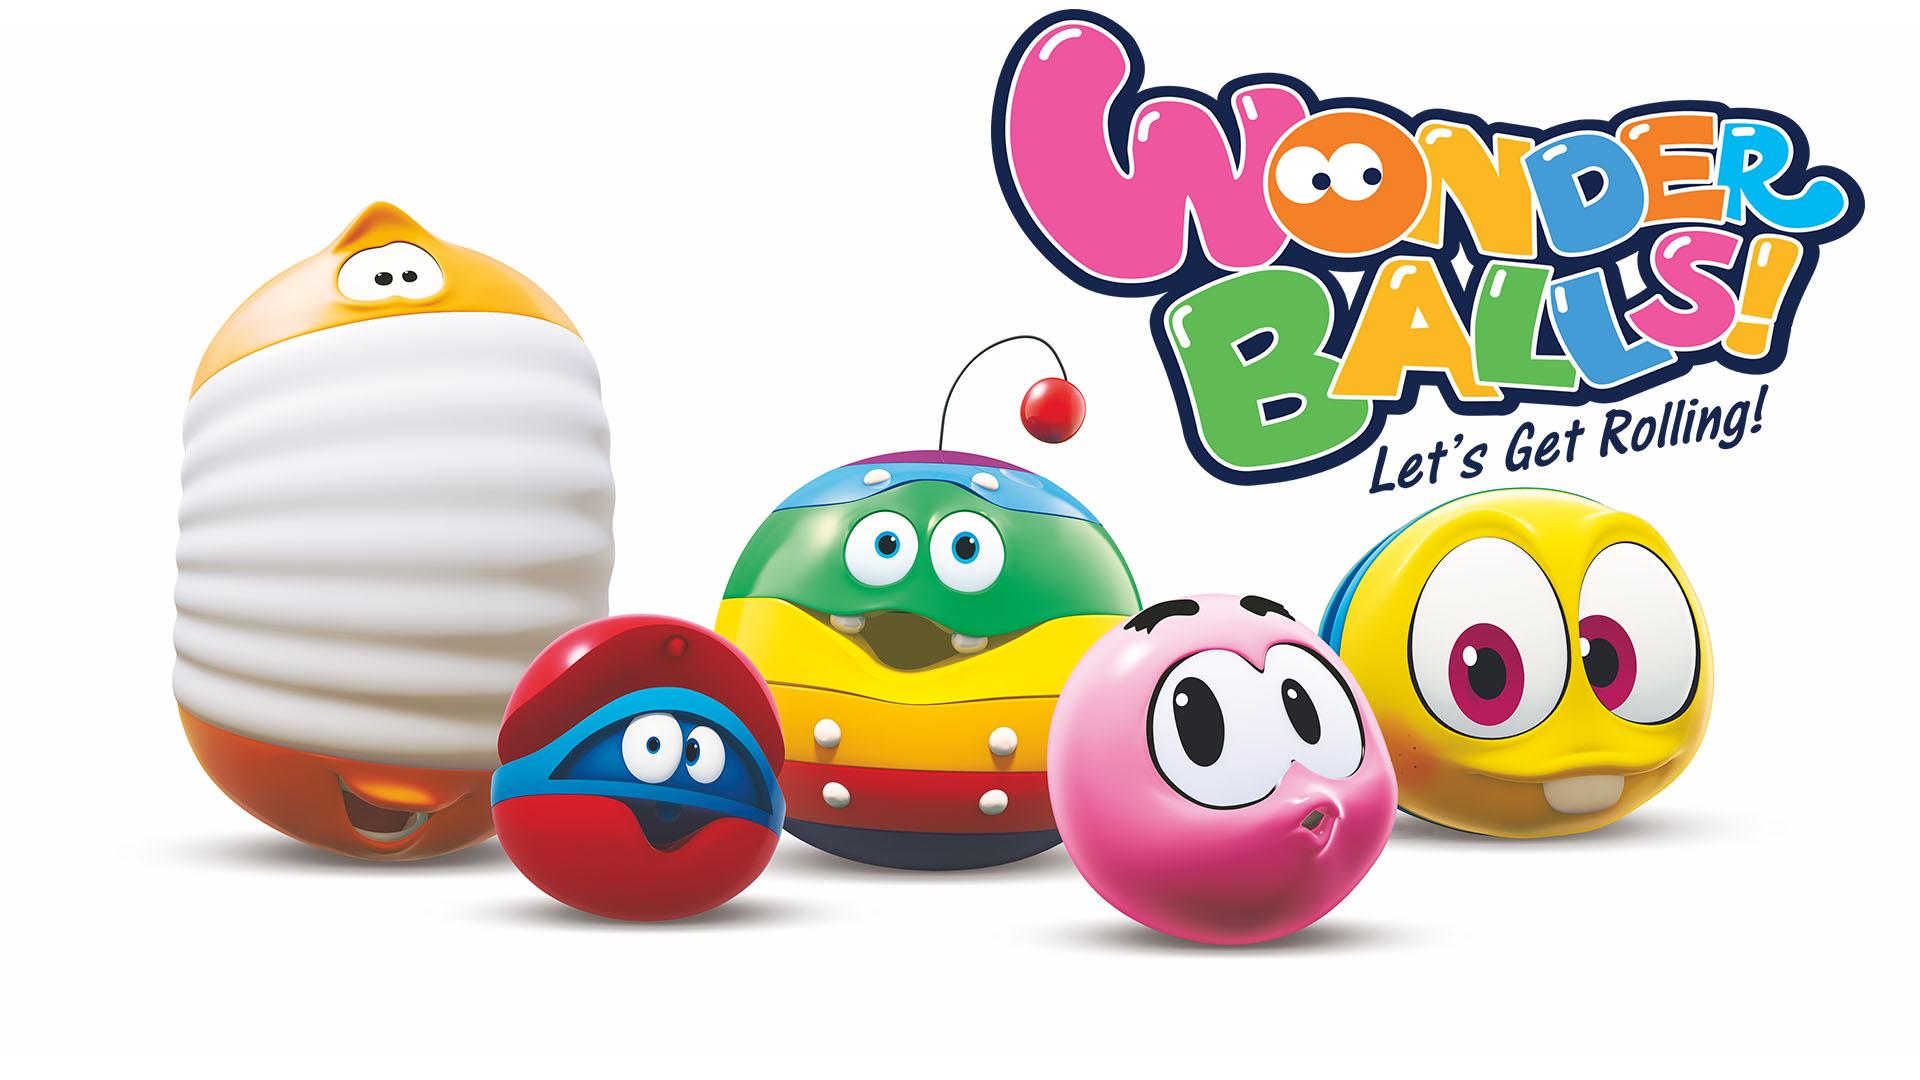 WonderBalls! Let's Get Rolling!